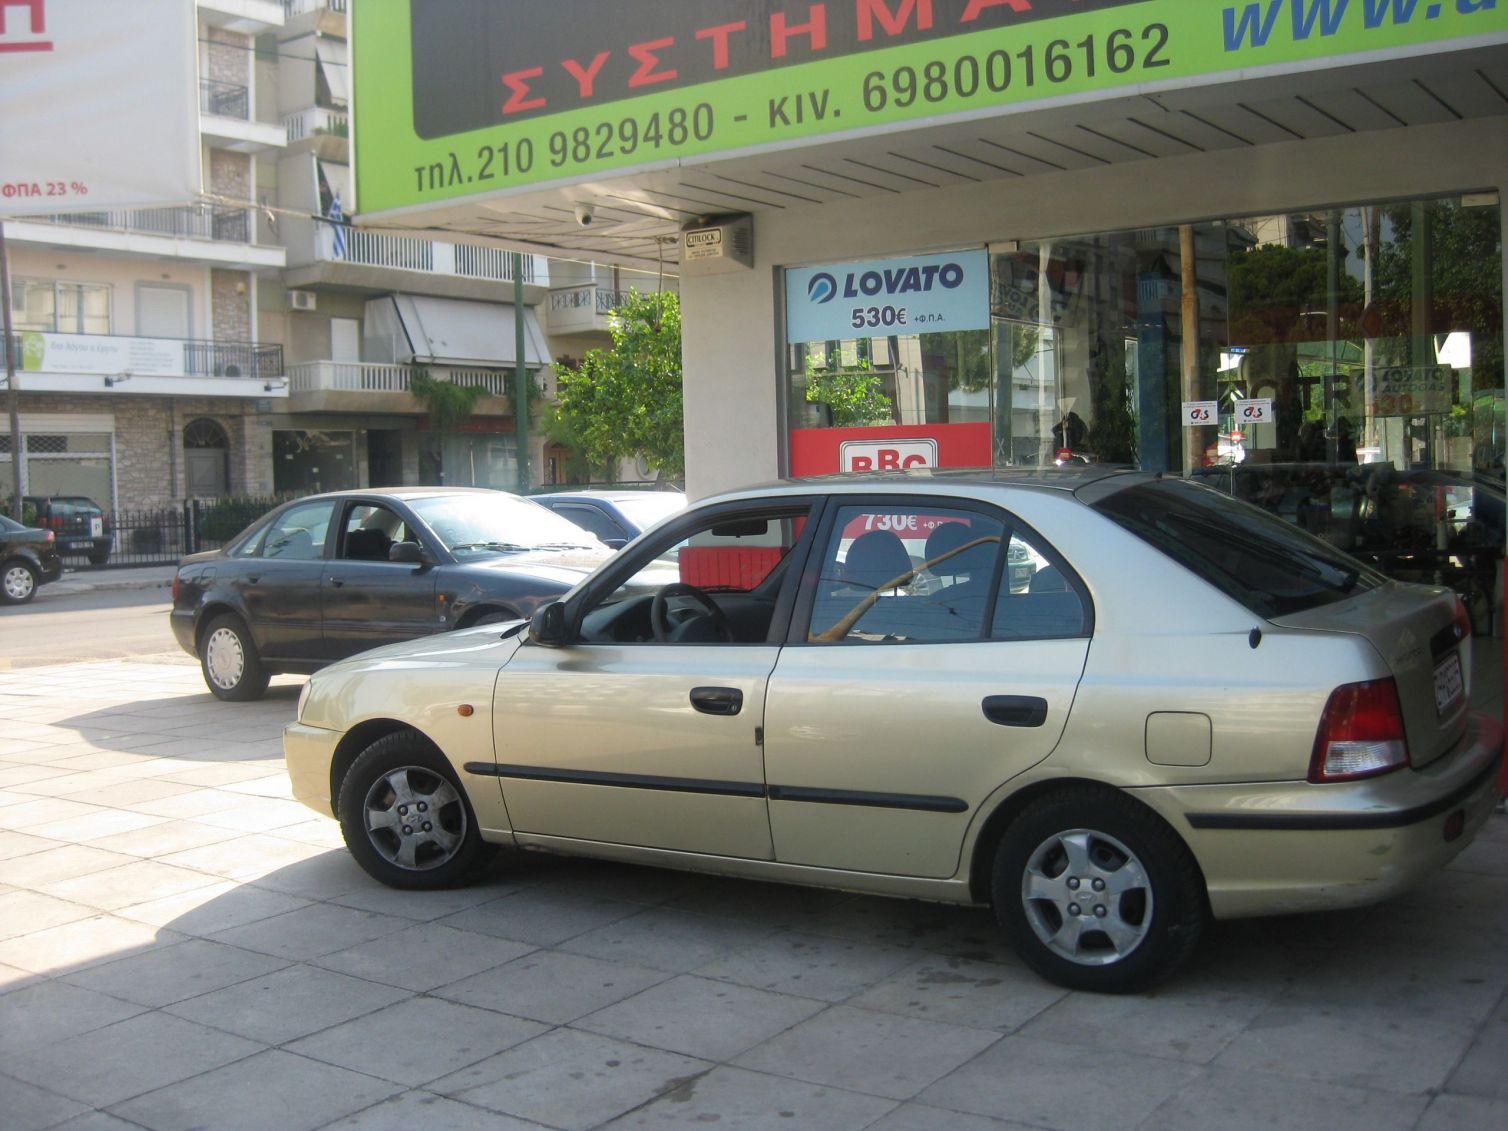 HYUNDAI ACCENT 1300cc '04 ME BRC 42LT